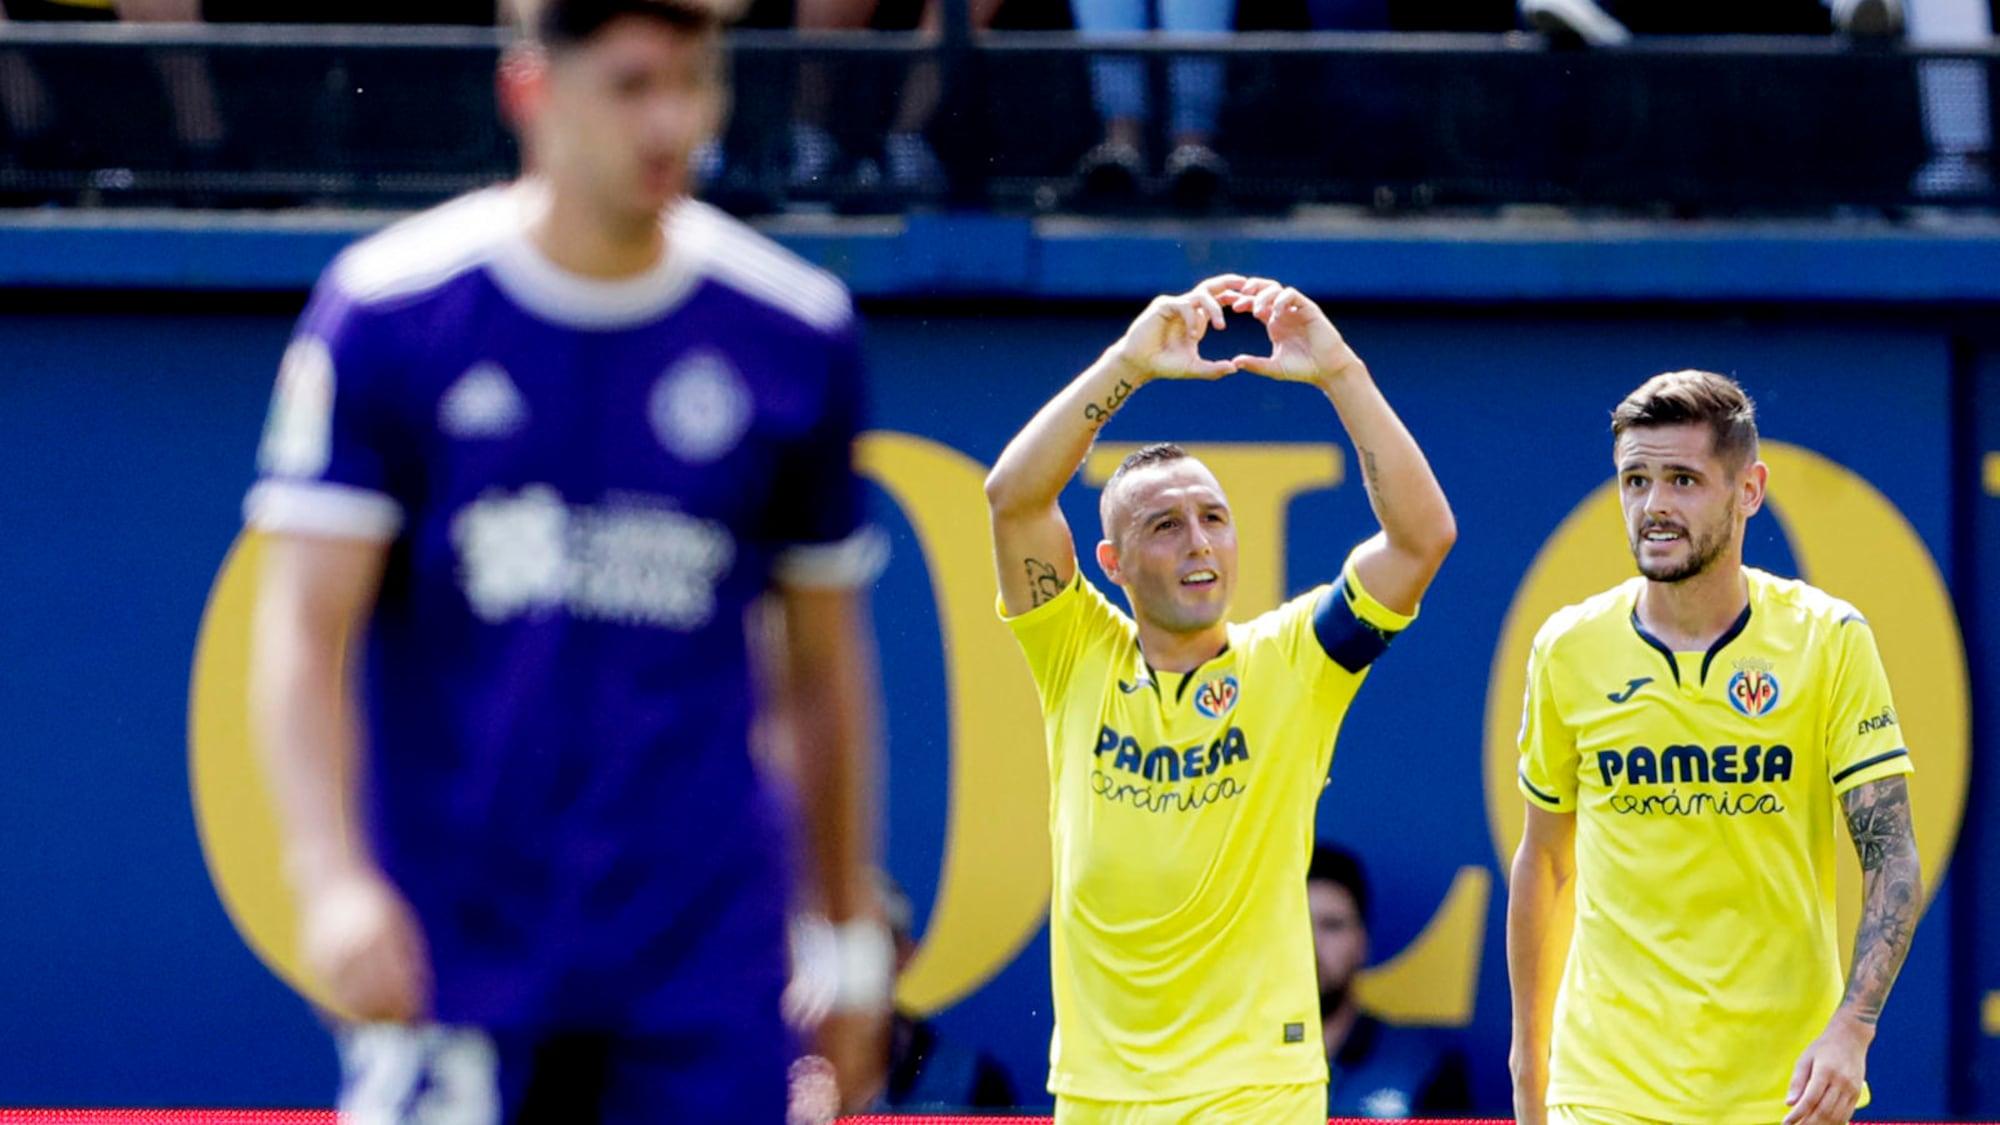 Villareal dank späten Toren: Ex-Arsenal-Starläutet Sieg gegen Real Valladolid ein